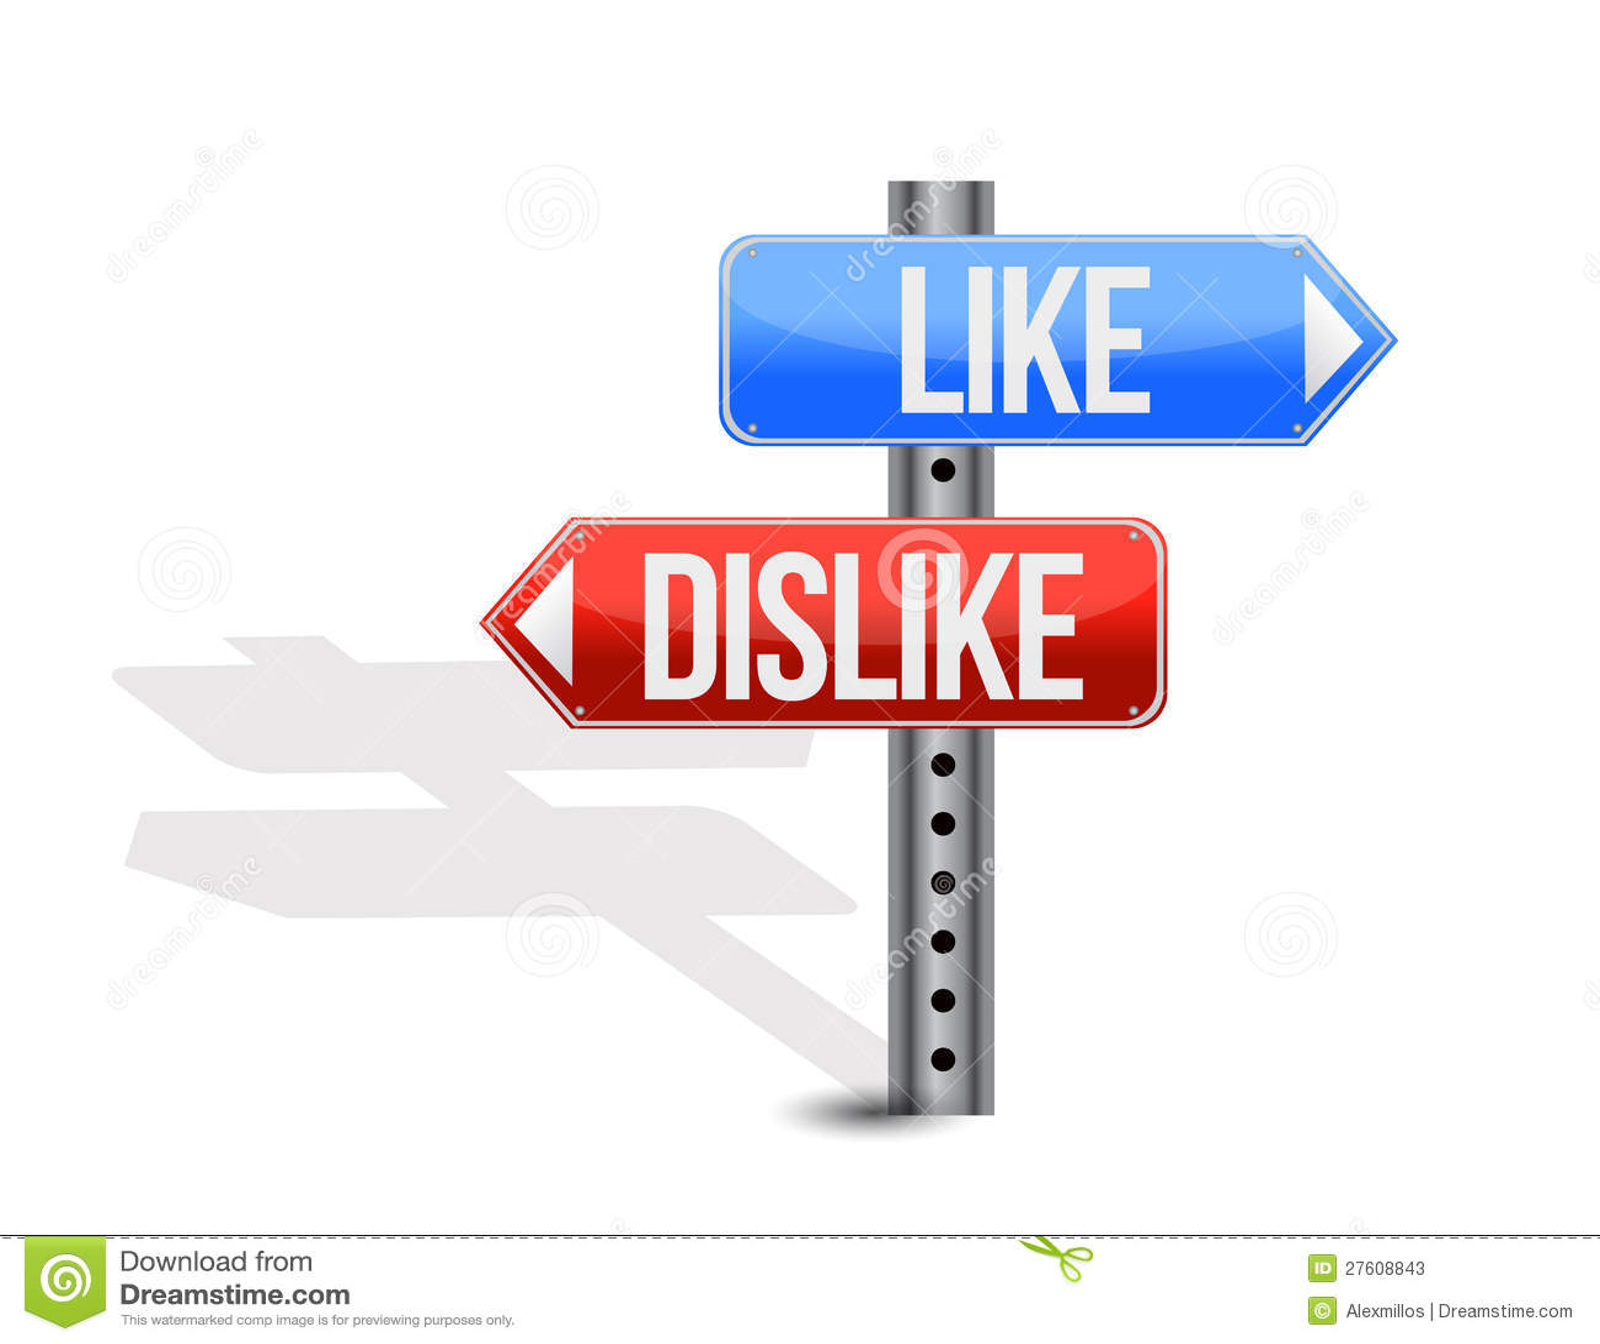 Dislike Of Time Travel